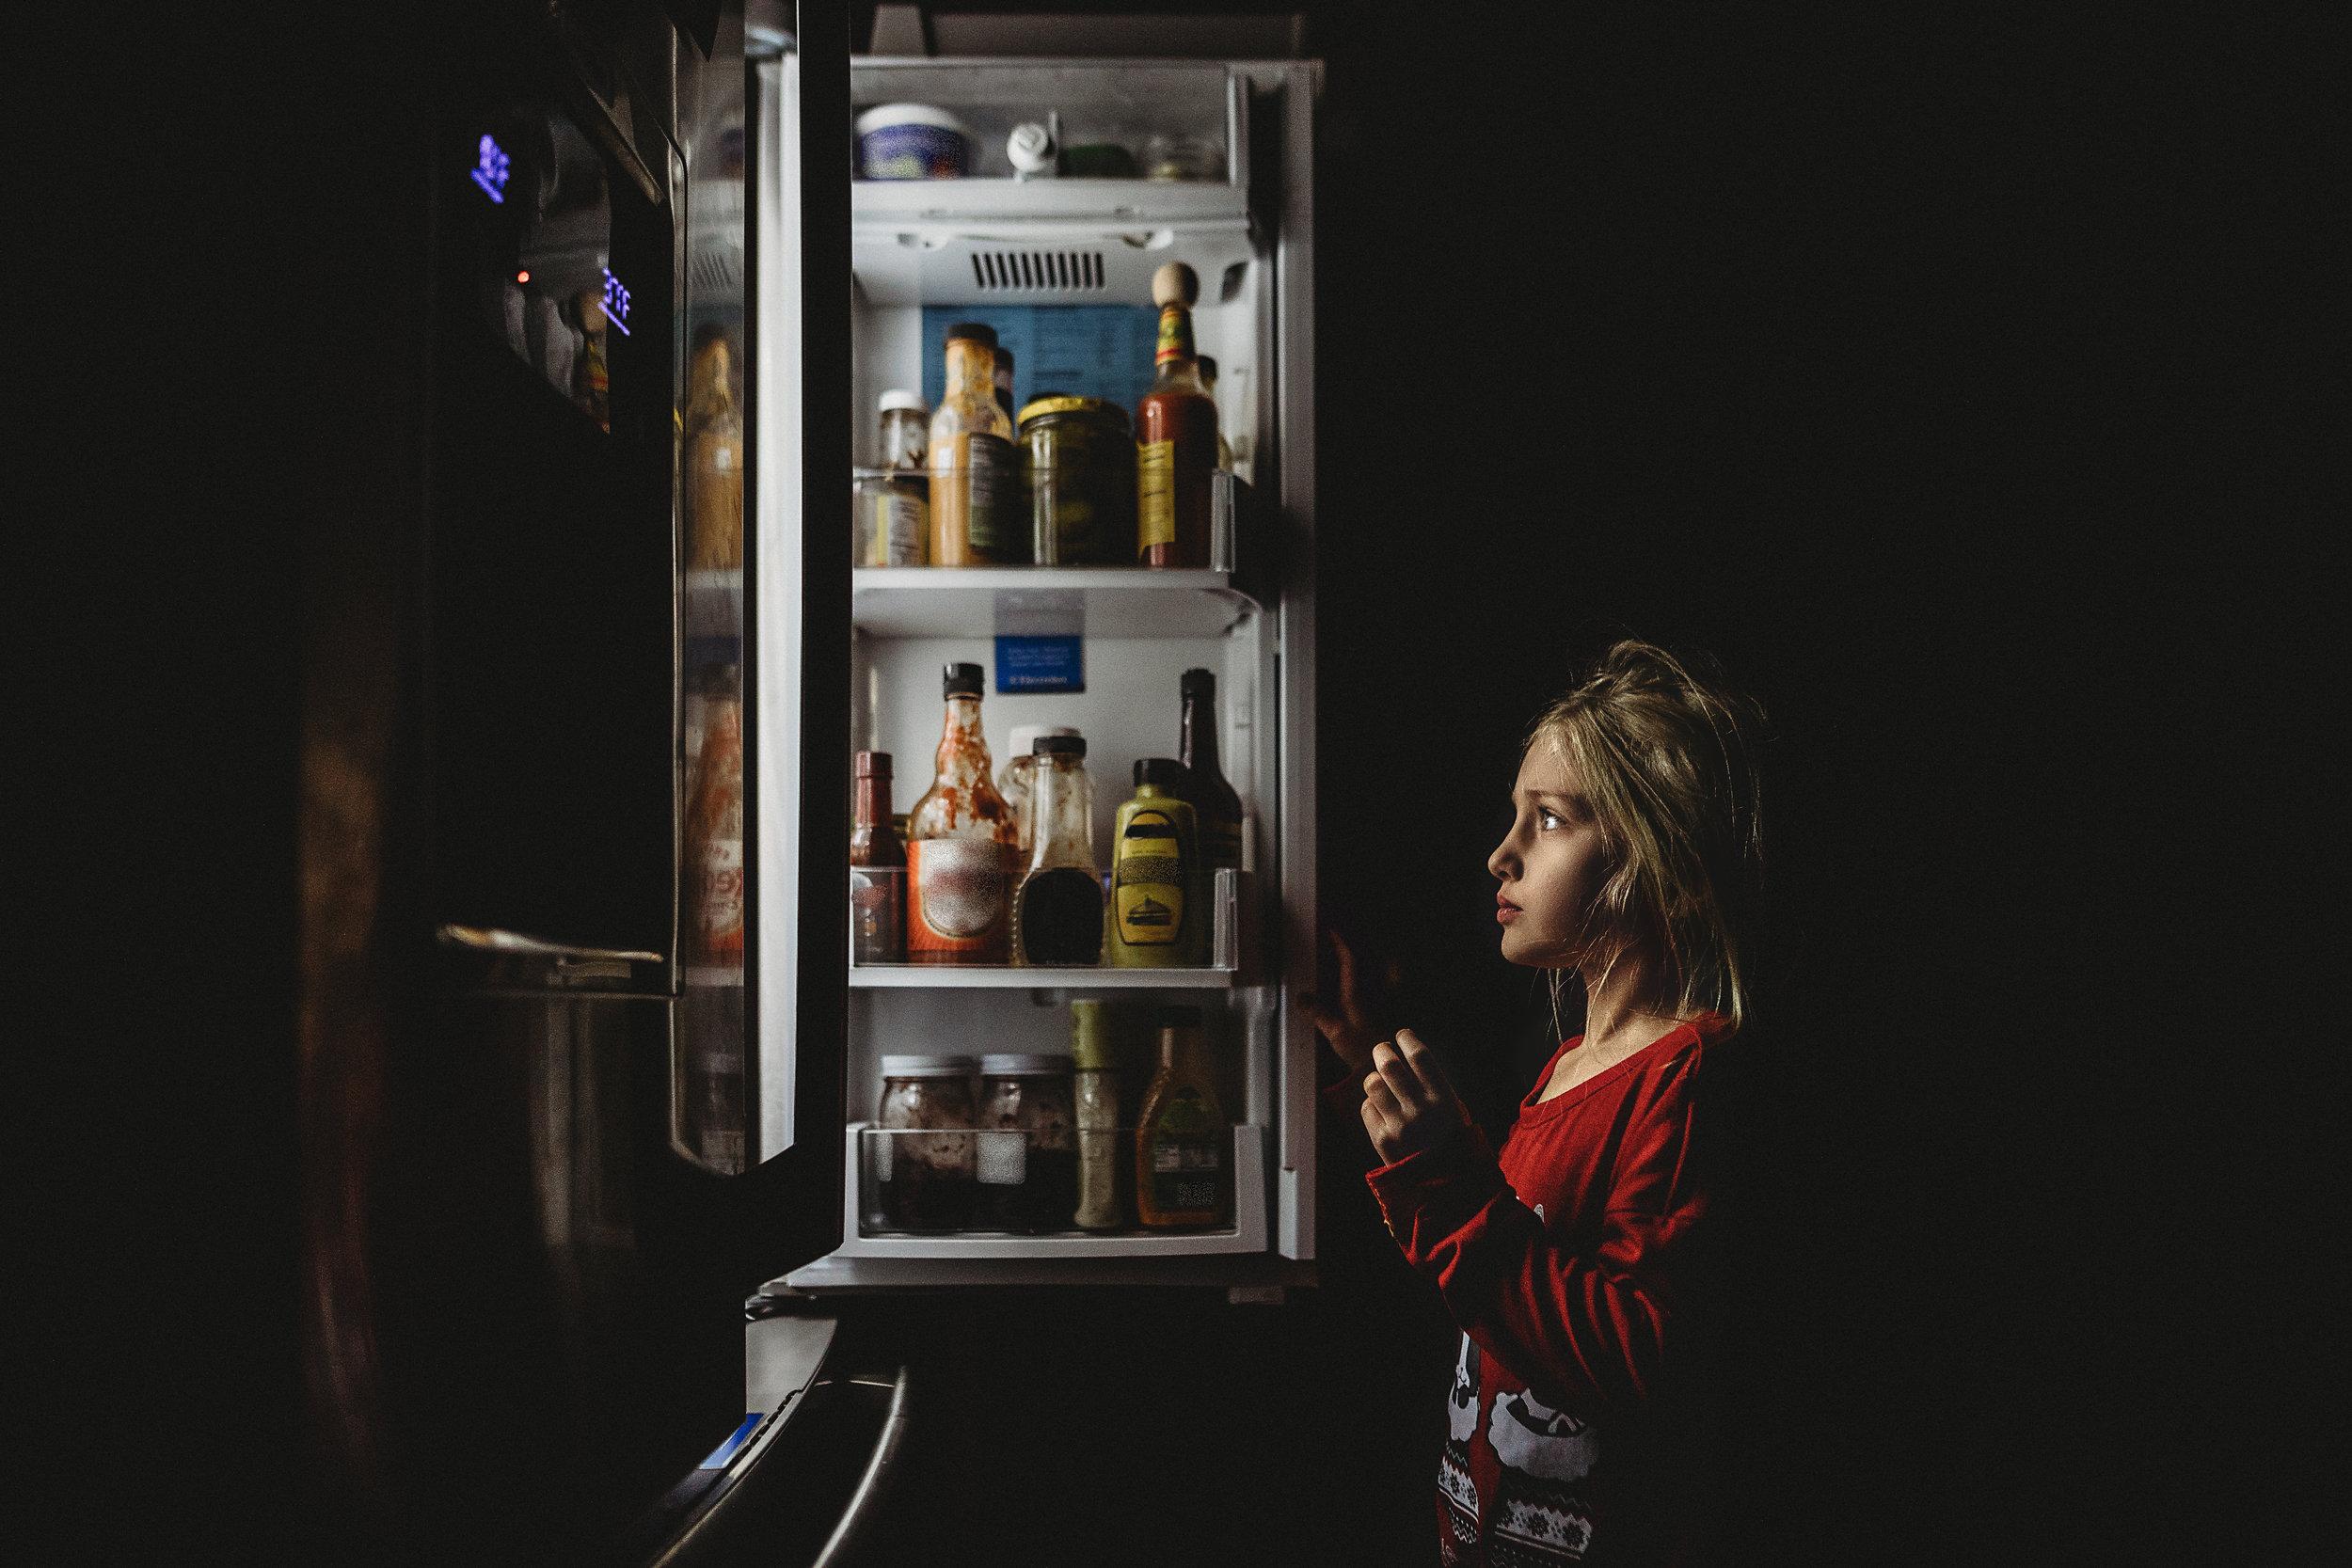 hello-olivia-photography-long-island-photographer-lifestyle-suffolk-child-girl-refridgerator-food.jpg